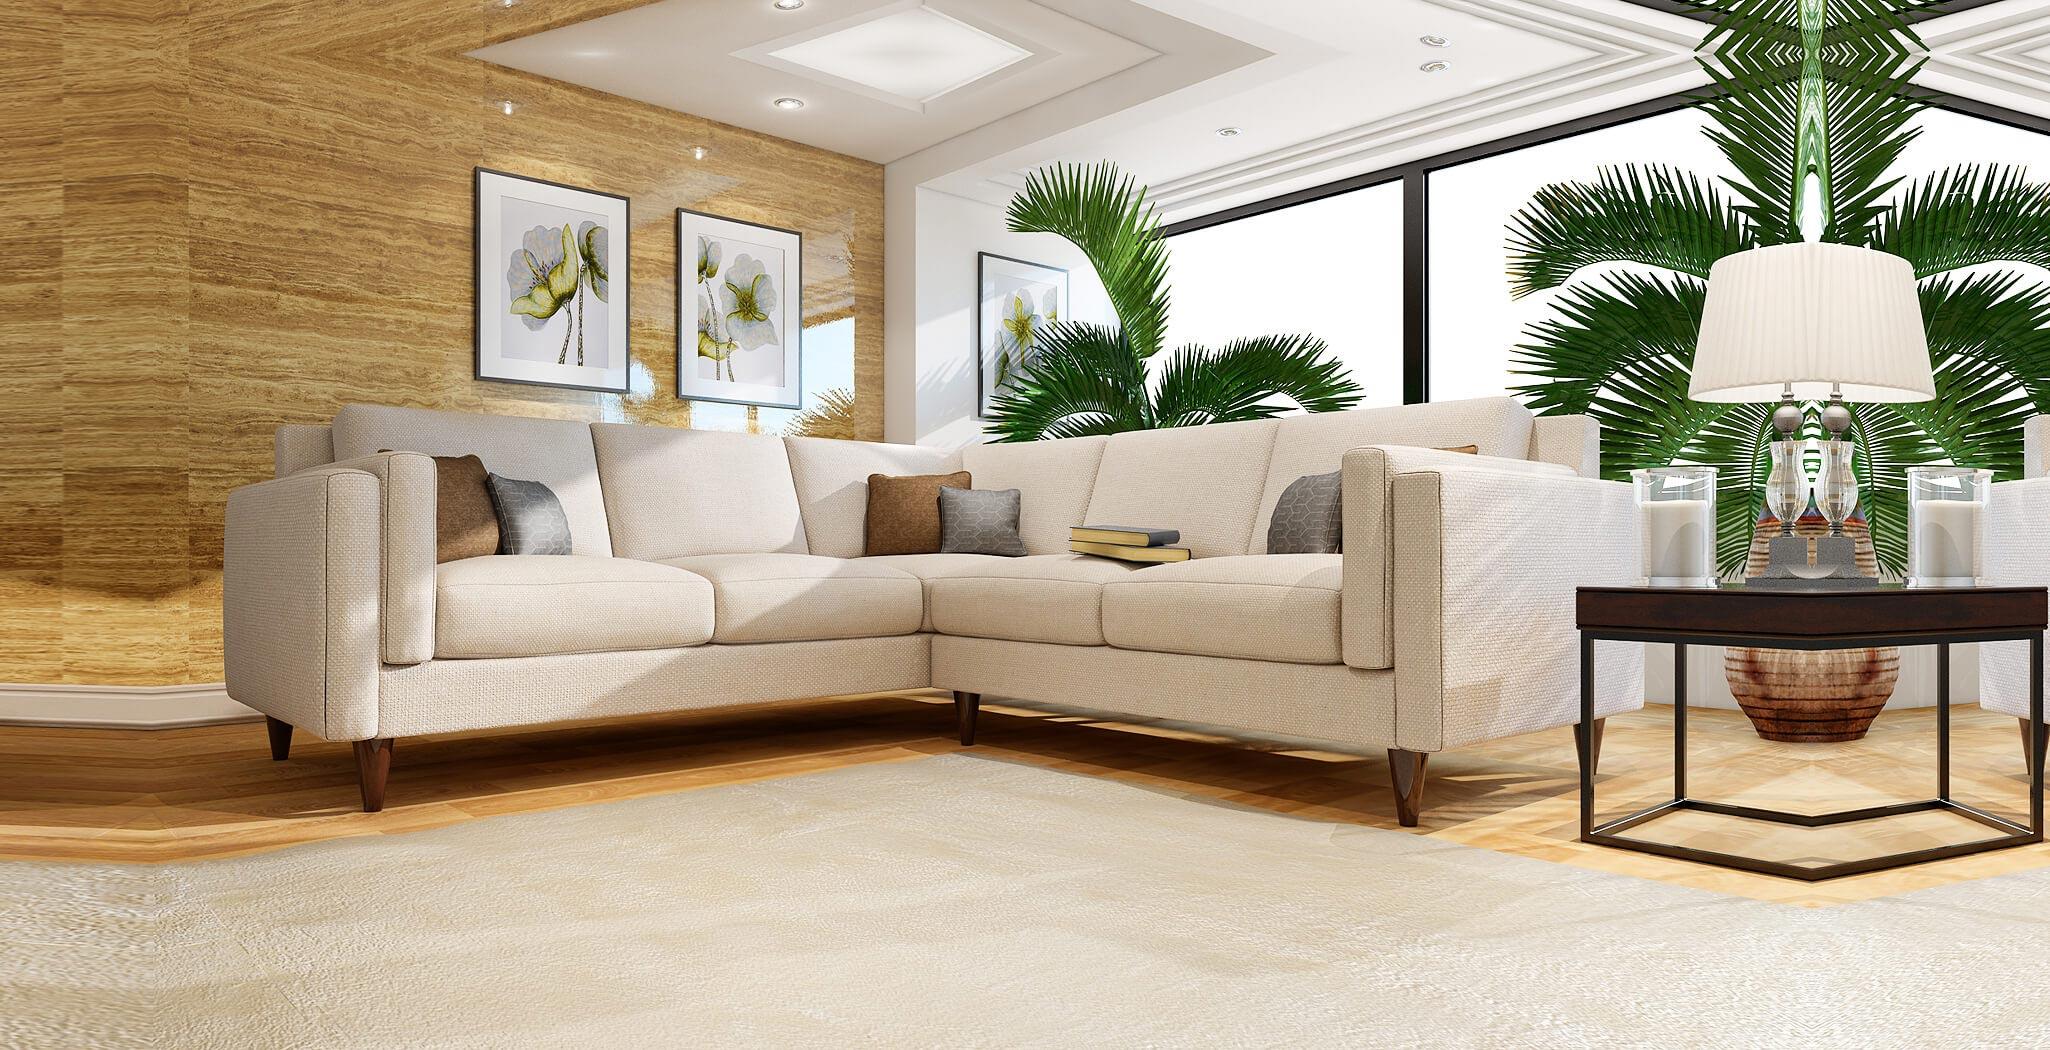 helsinki sectional furniture gallery 1